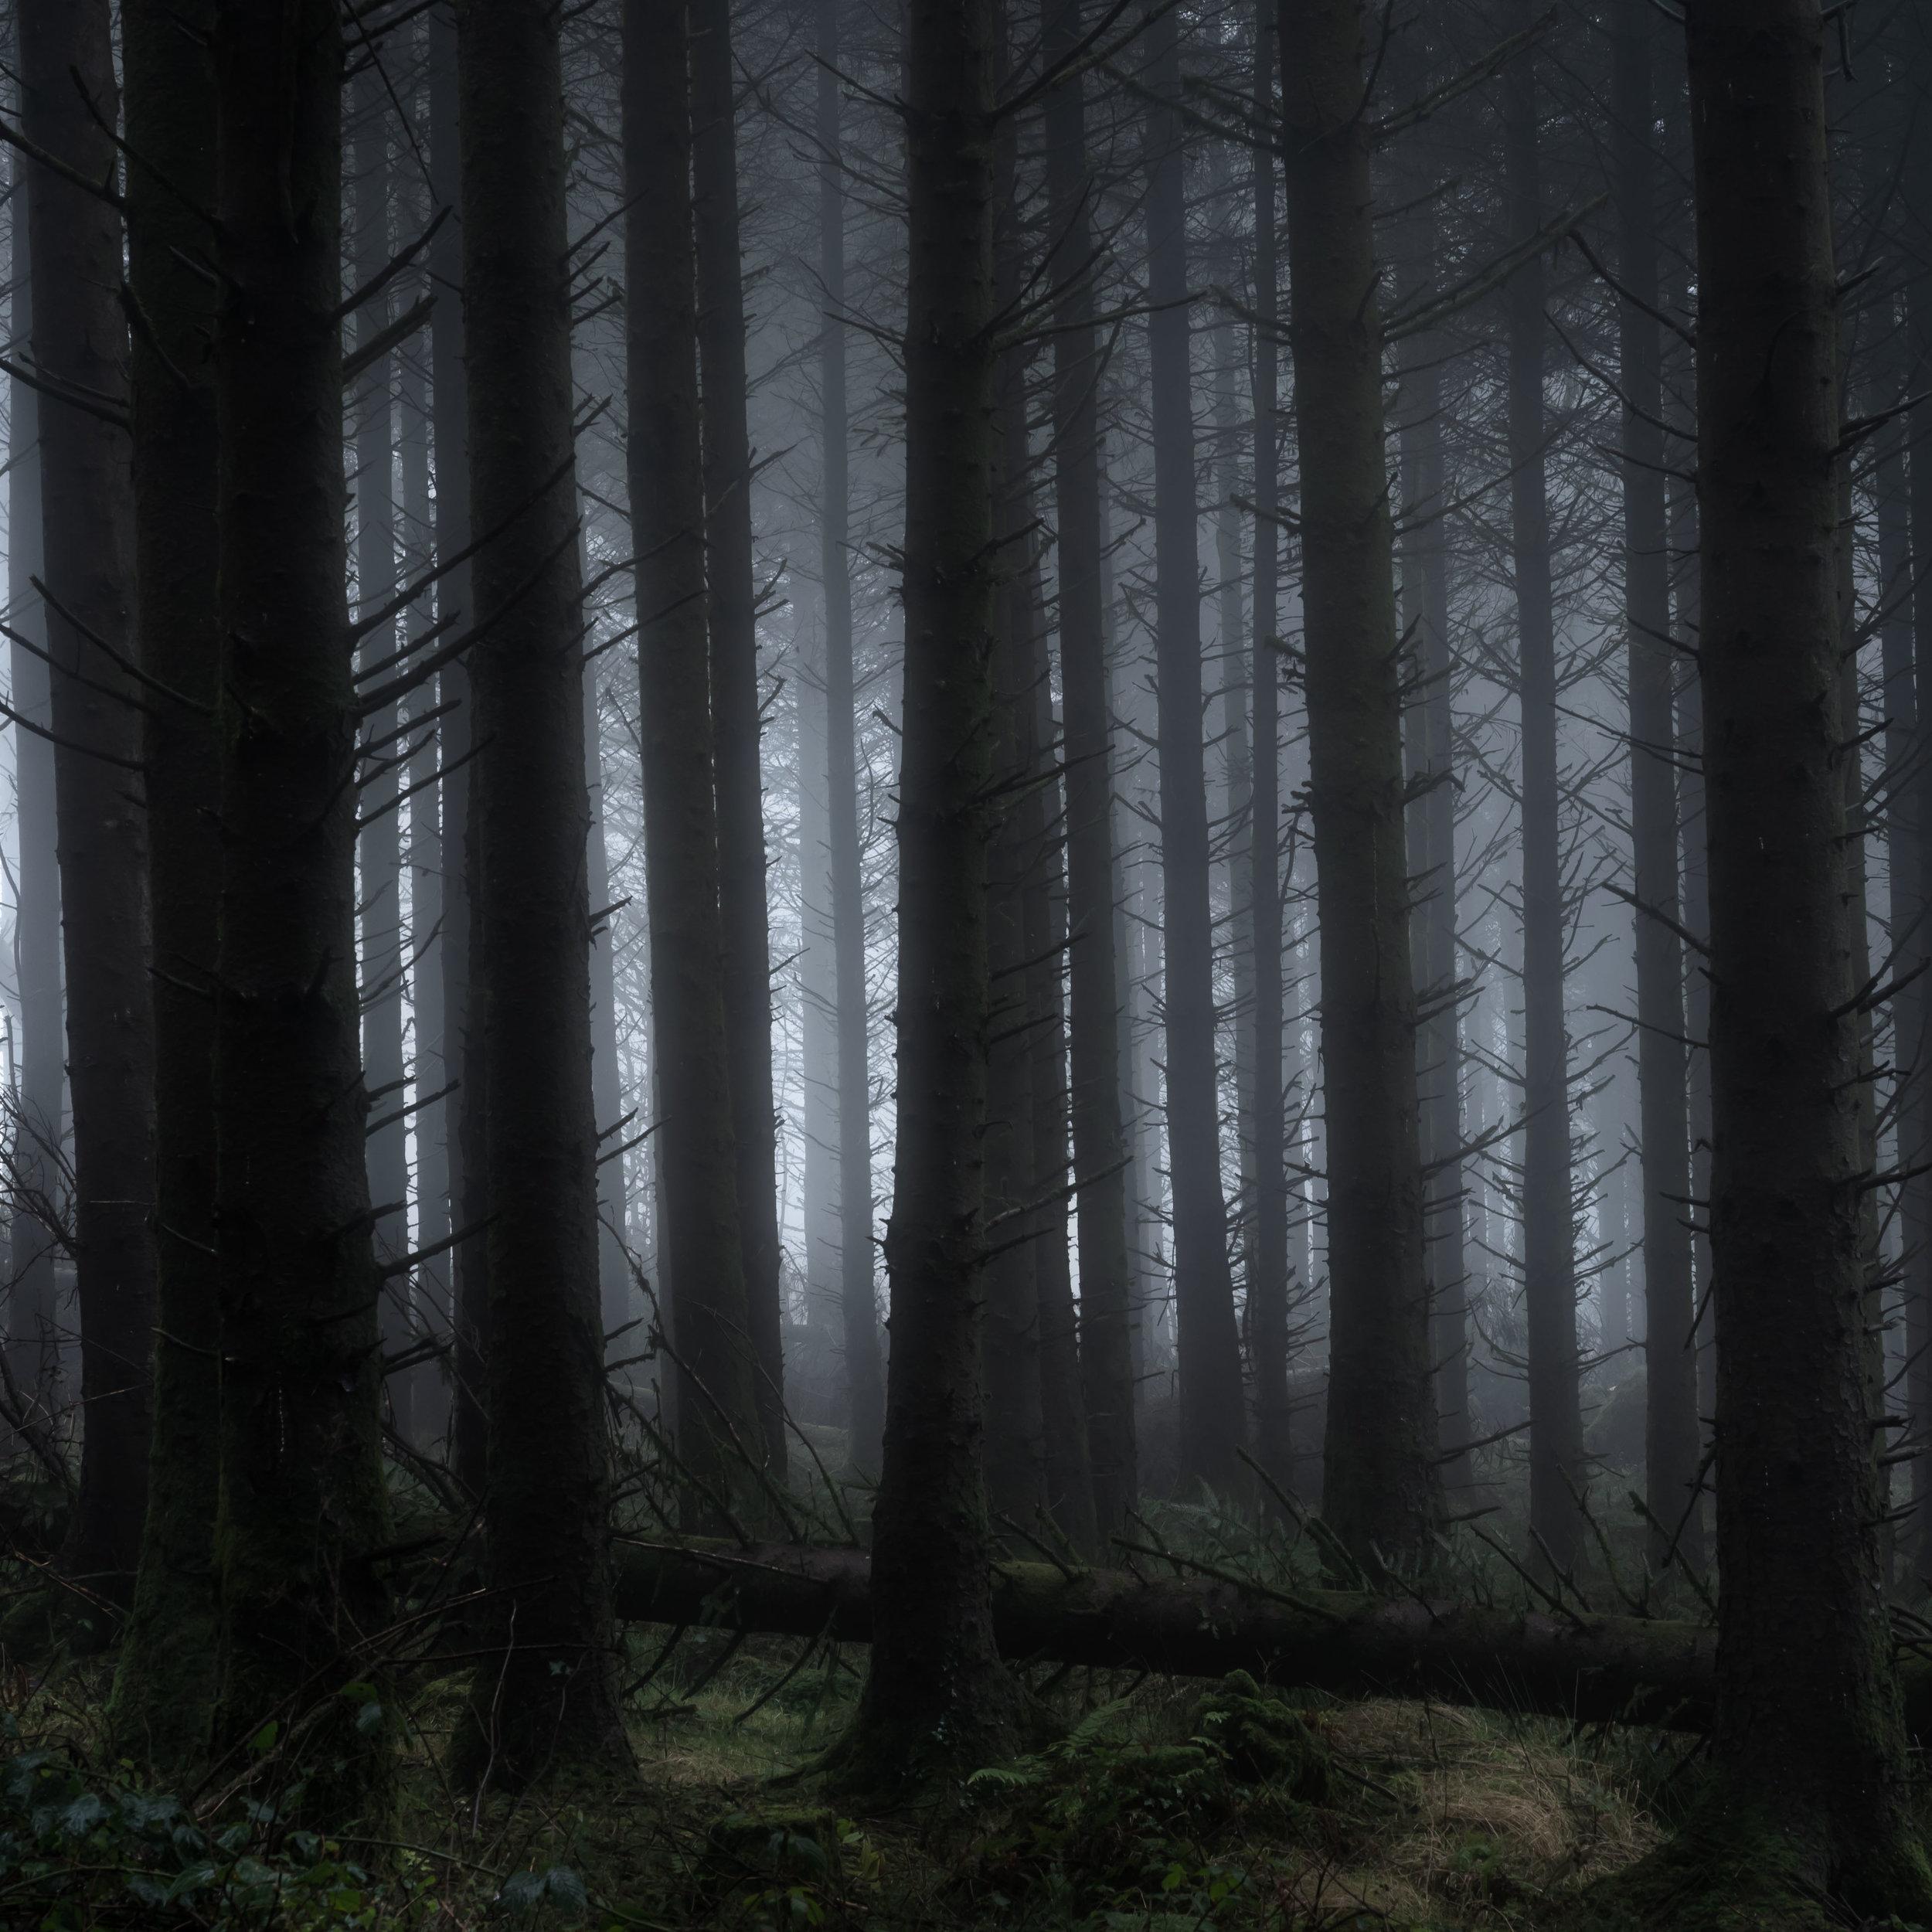 Like a scene from Sleepy Hollow!